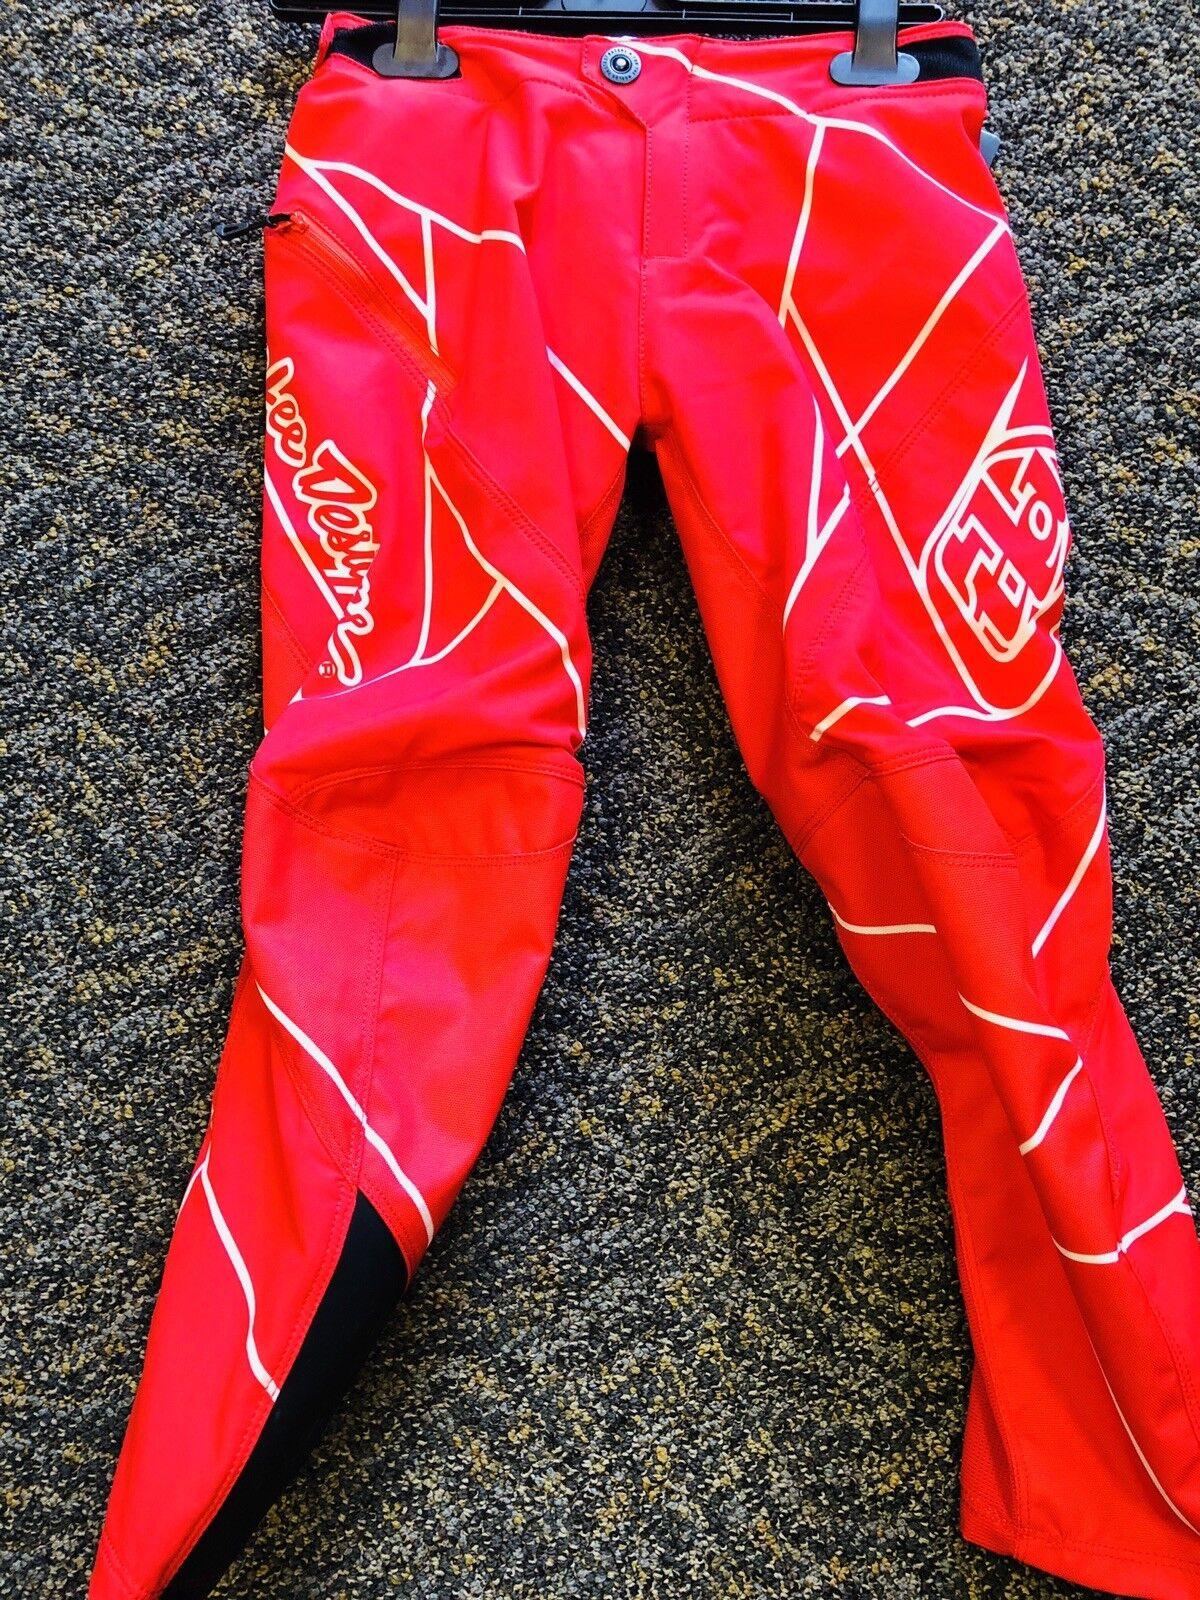 Troy Lee Designs Boys Sprint Metric BMX/ Downhill Bicycle Pant